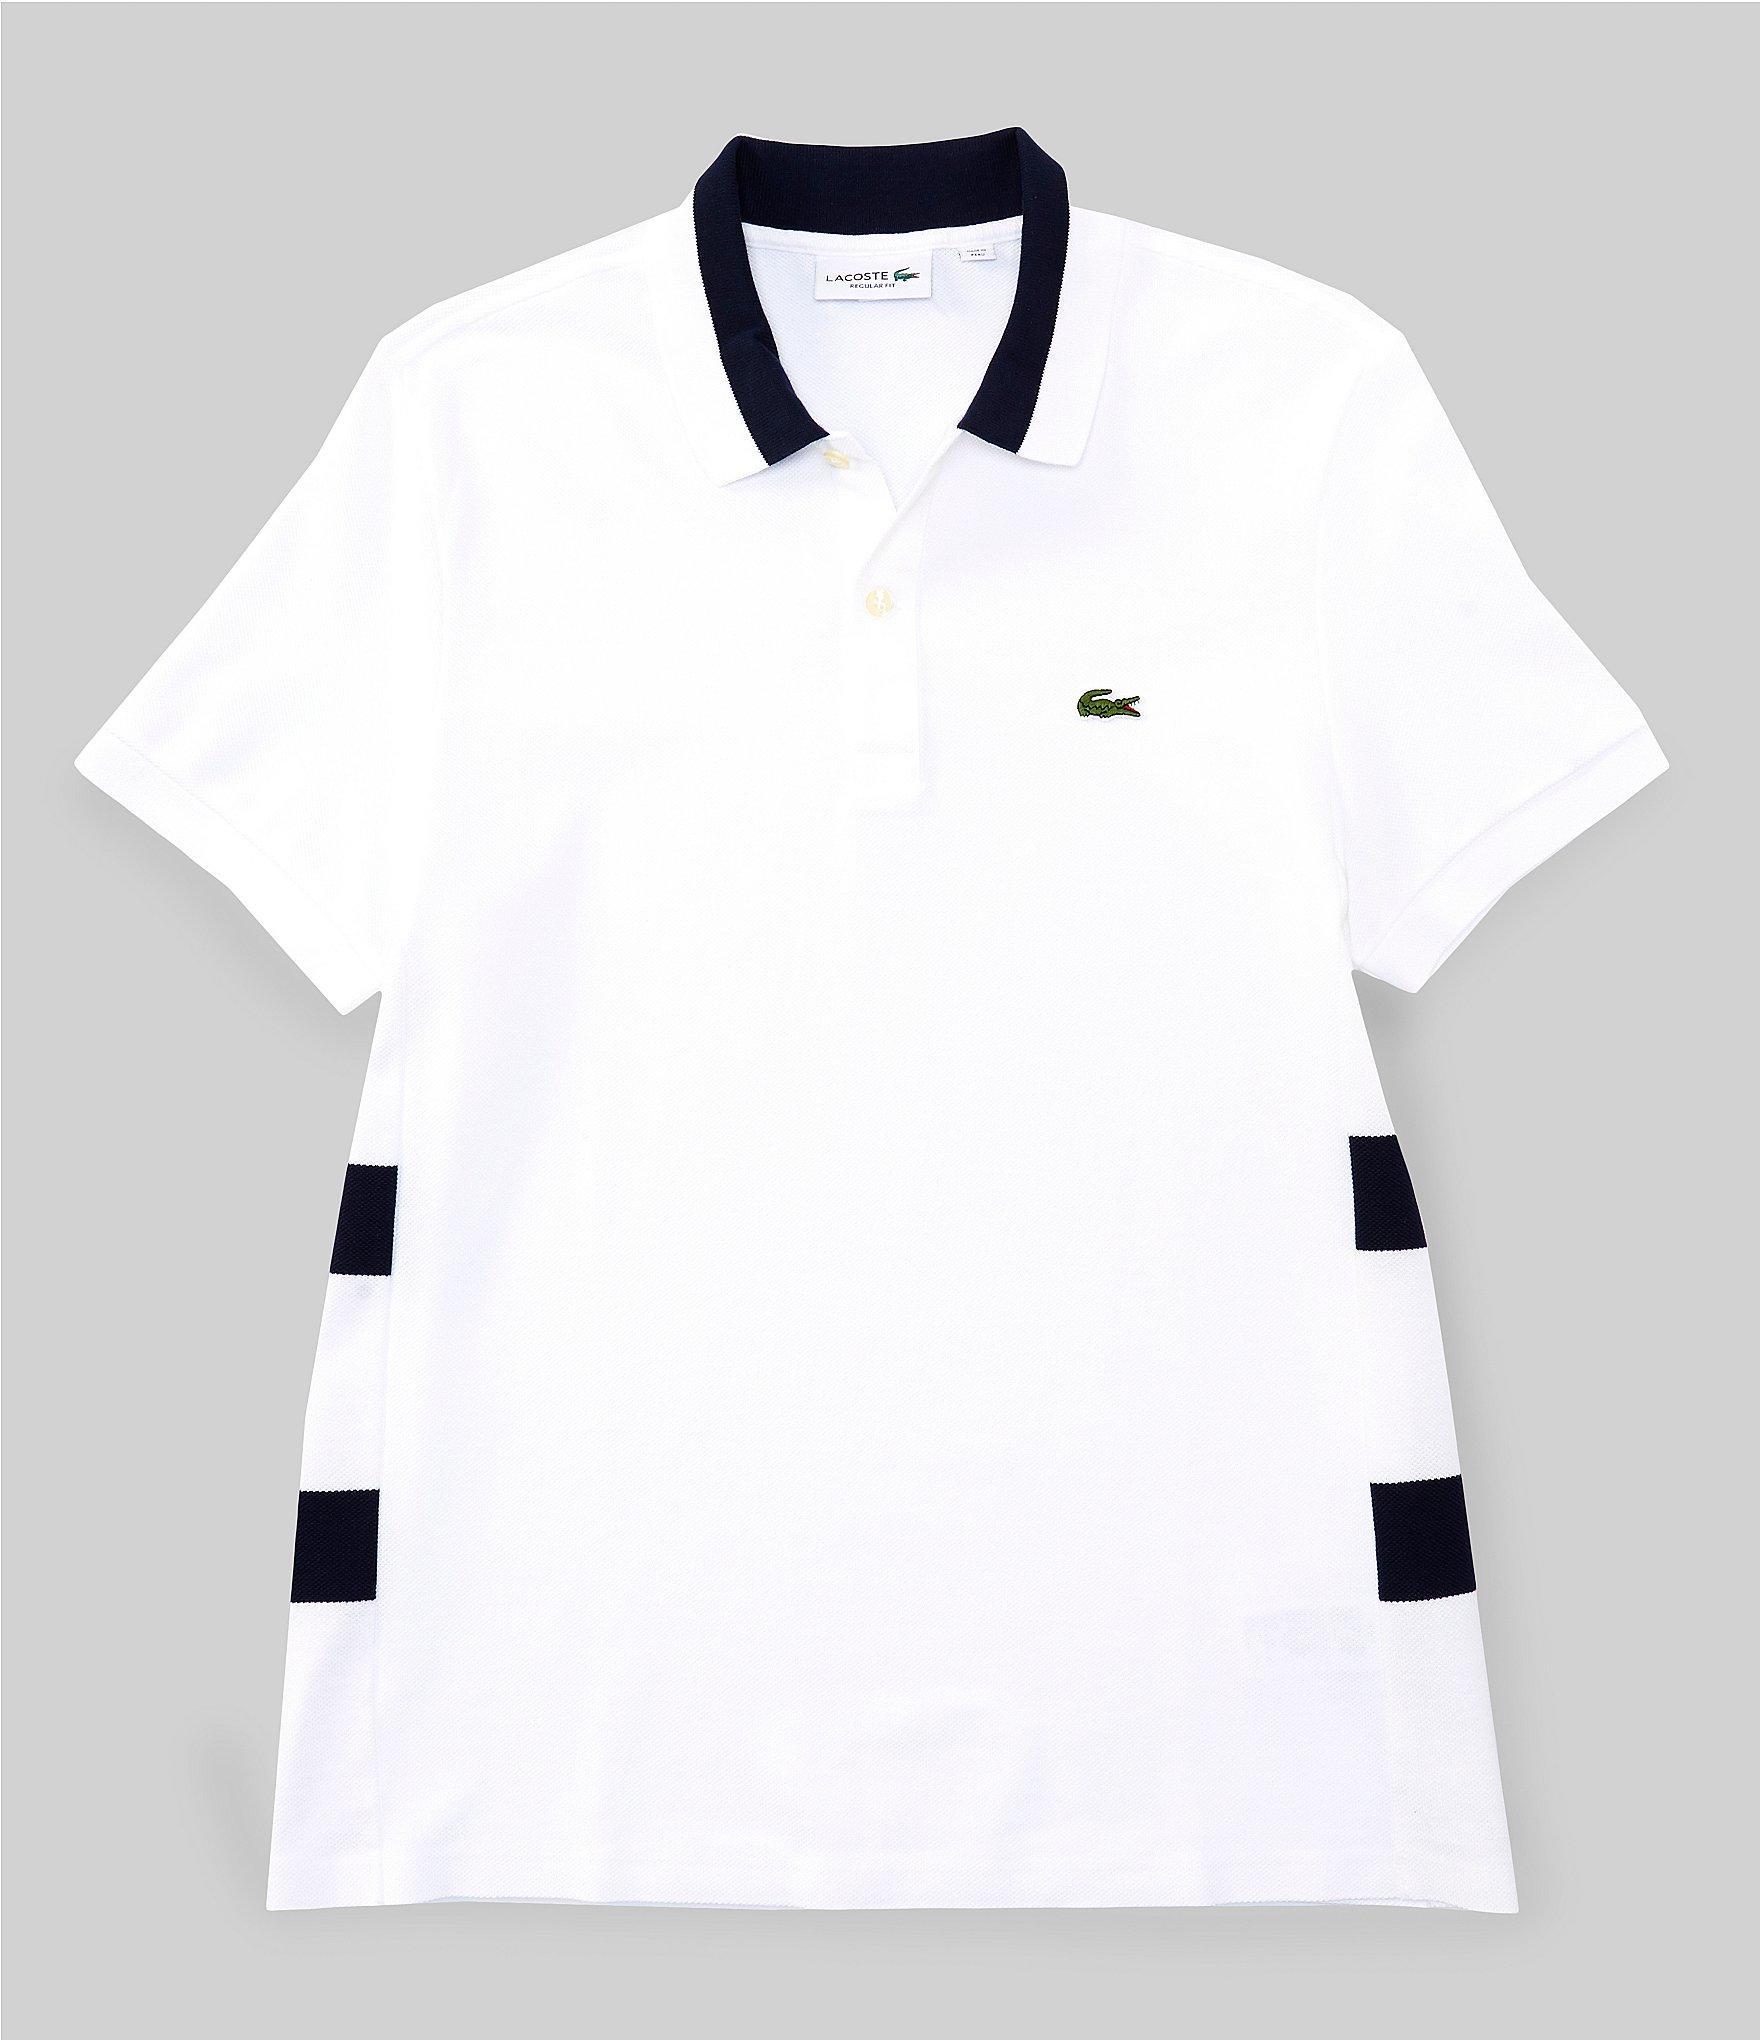 dbe5688636 Lacoste - Blue Side Stripe Short-sleeve Polo Shirt for Men - Lyst. View  fullscreen